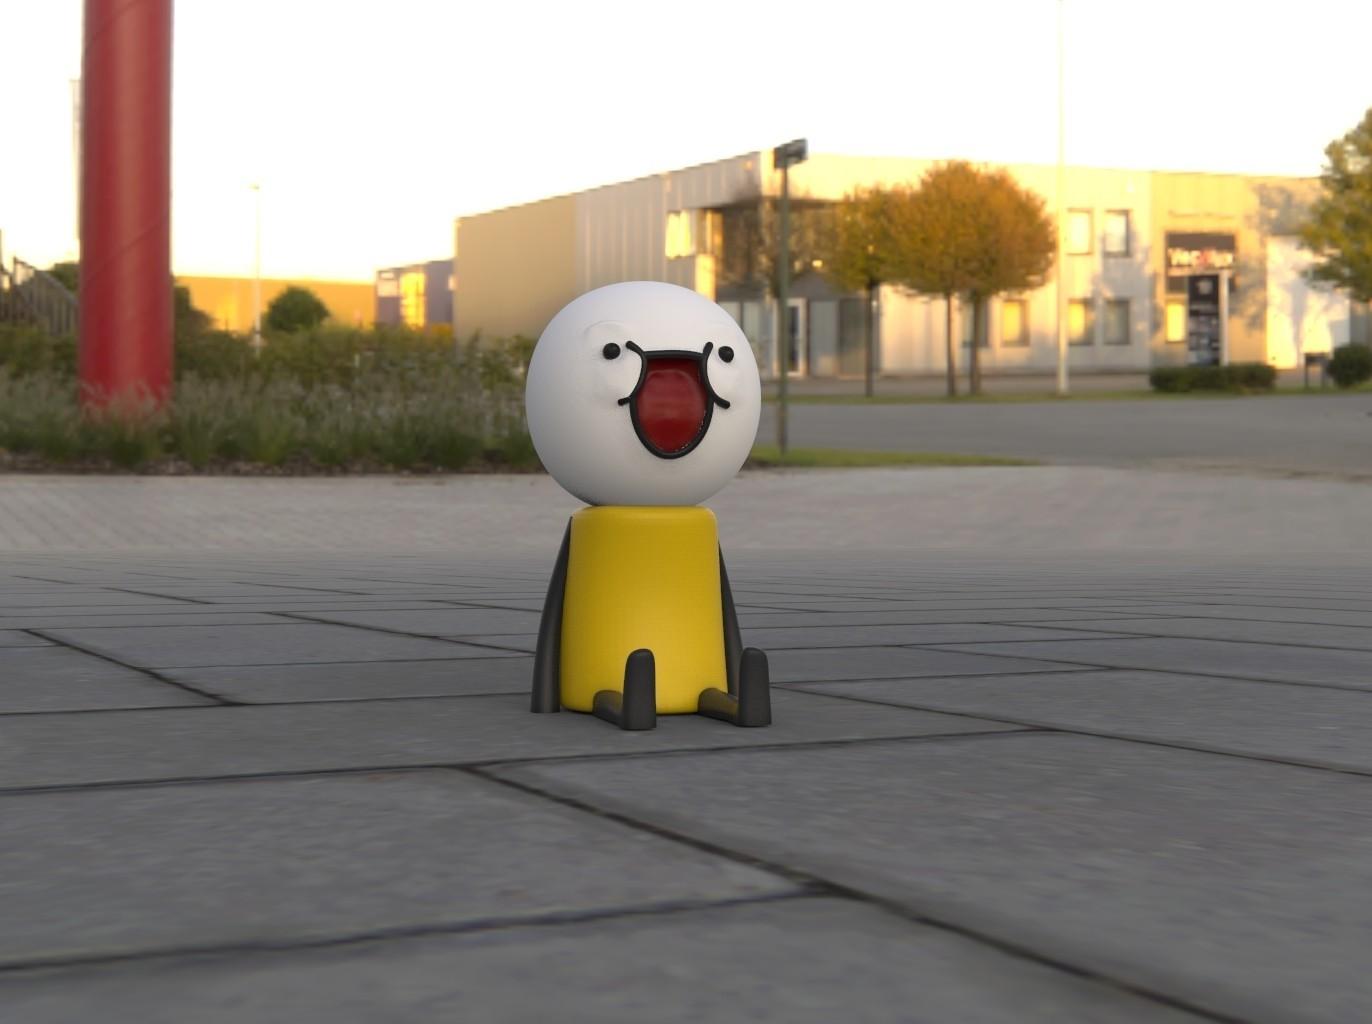 omino.10.jpg Download free STL file Un omino (a stickman) seduto • 3D print design, thePixelsChips